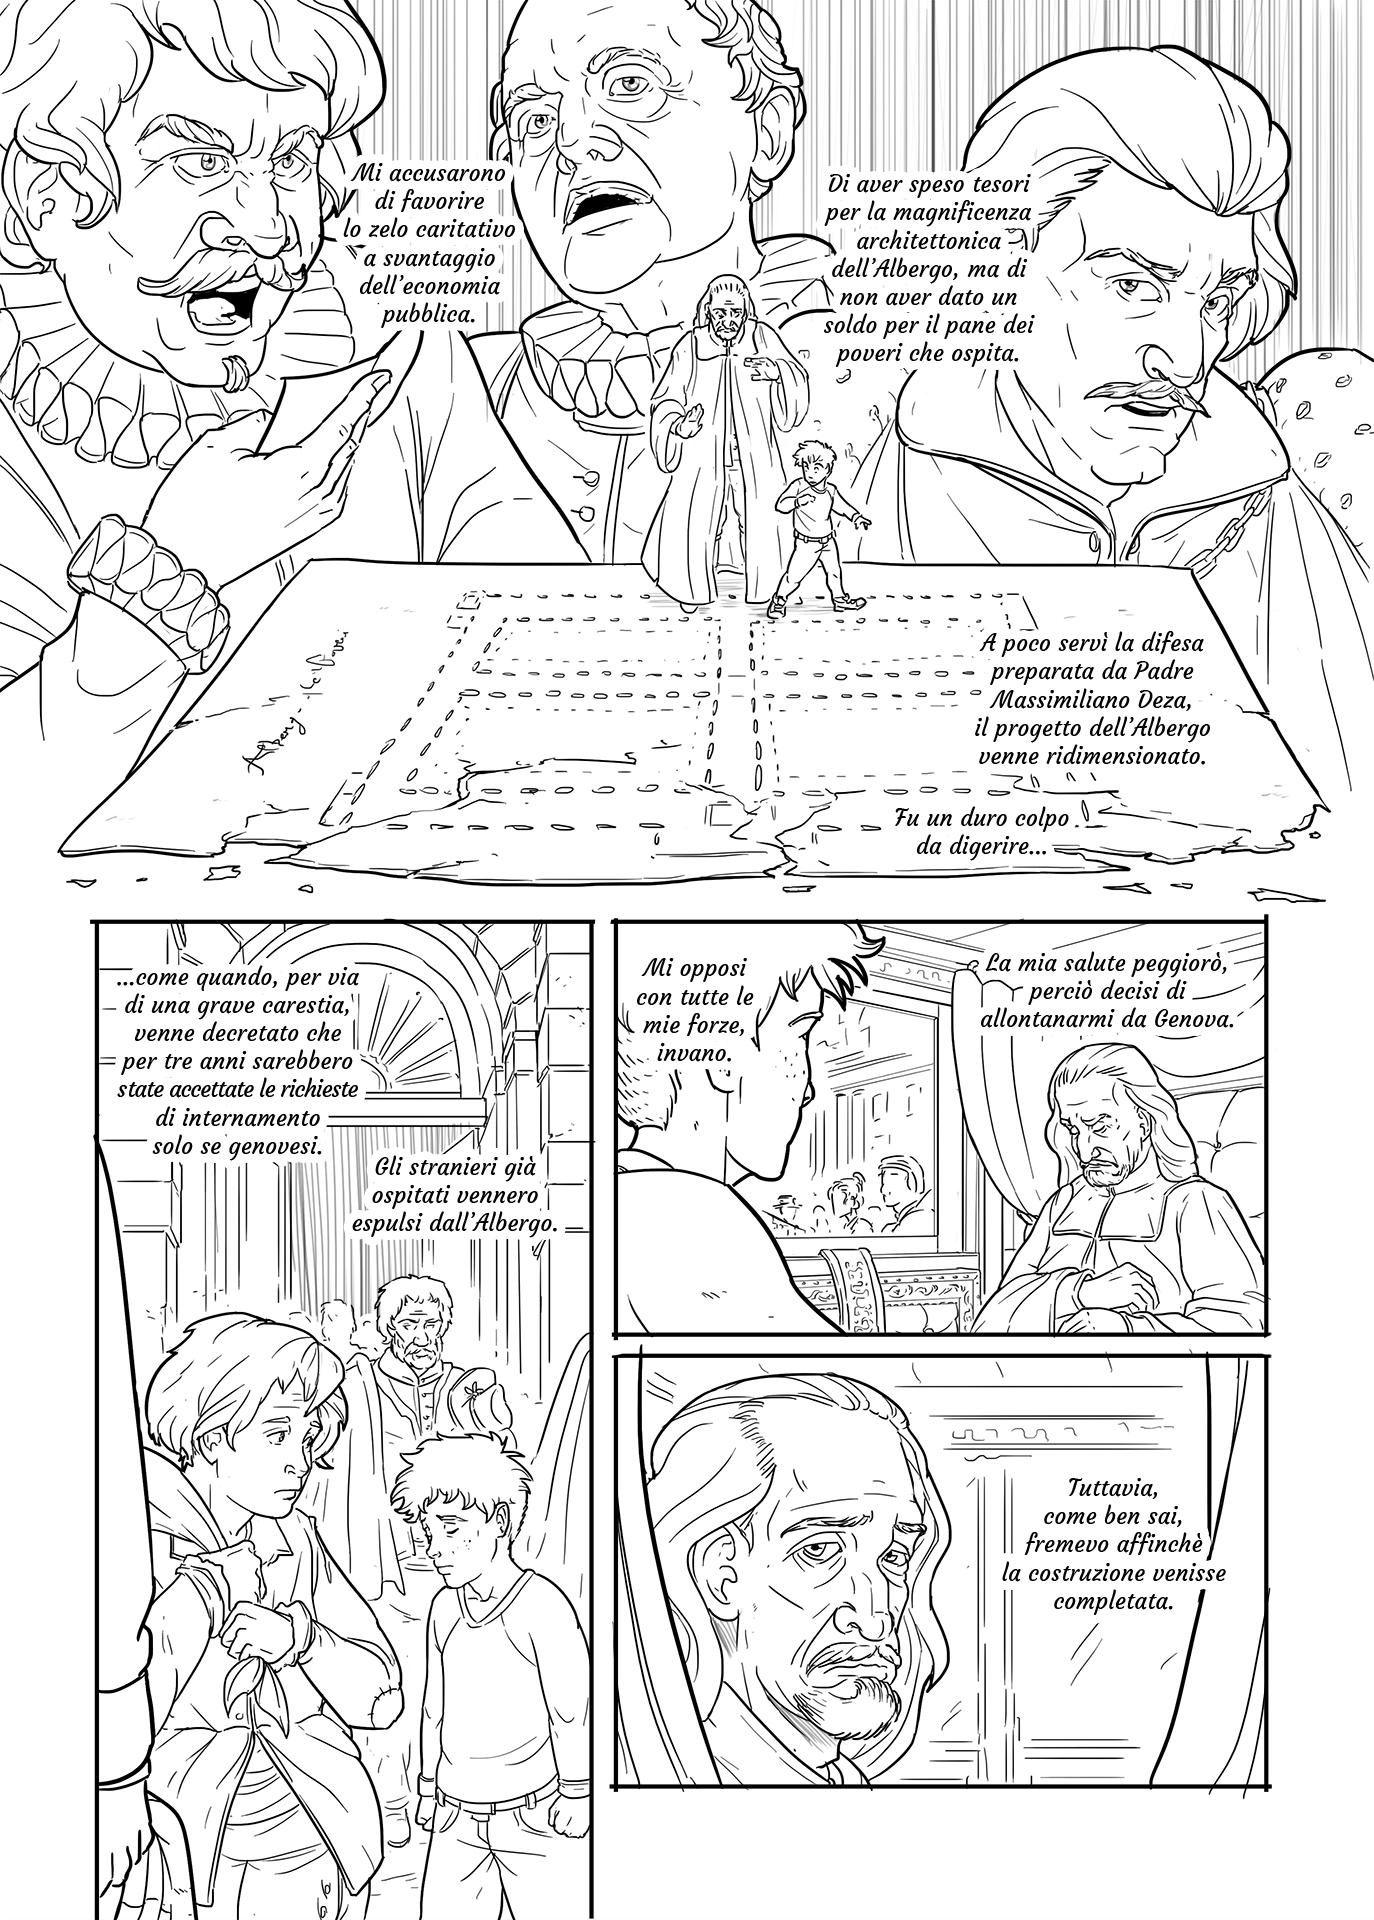 Fumetto Brignole tavola 32